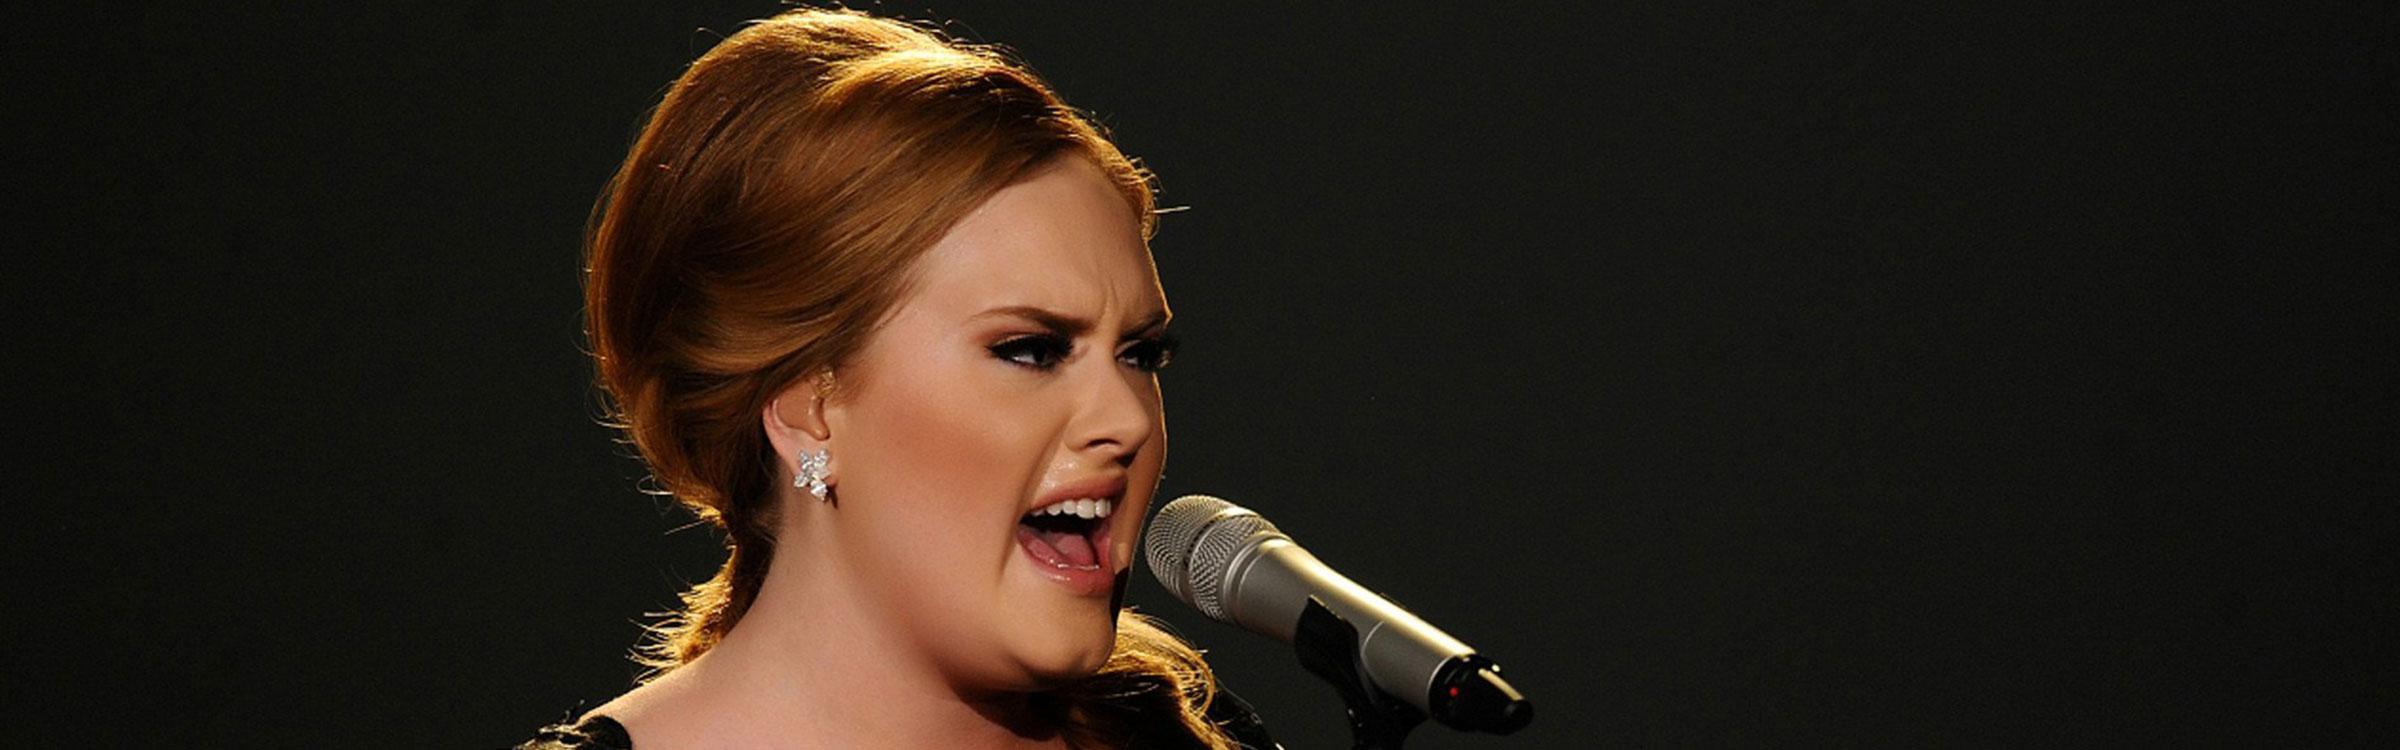 Adele singing 1920x1200 wide wallpapers.net